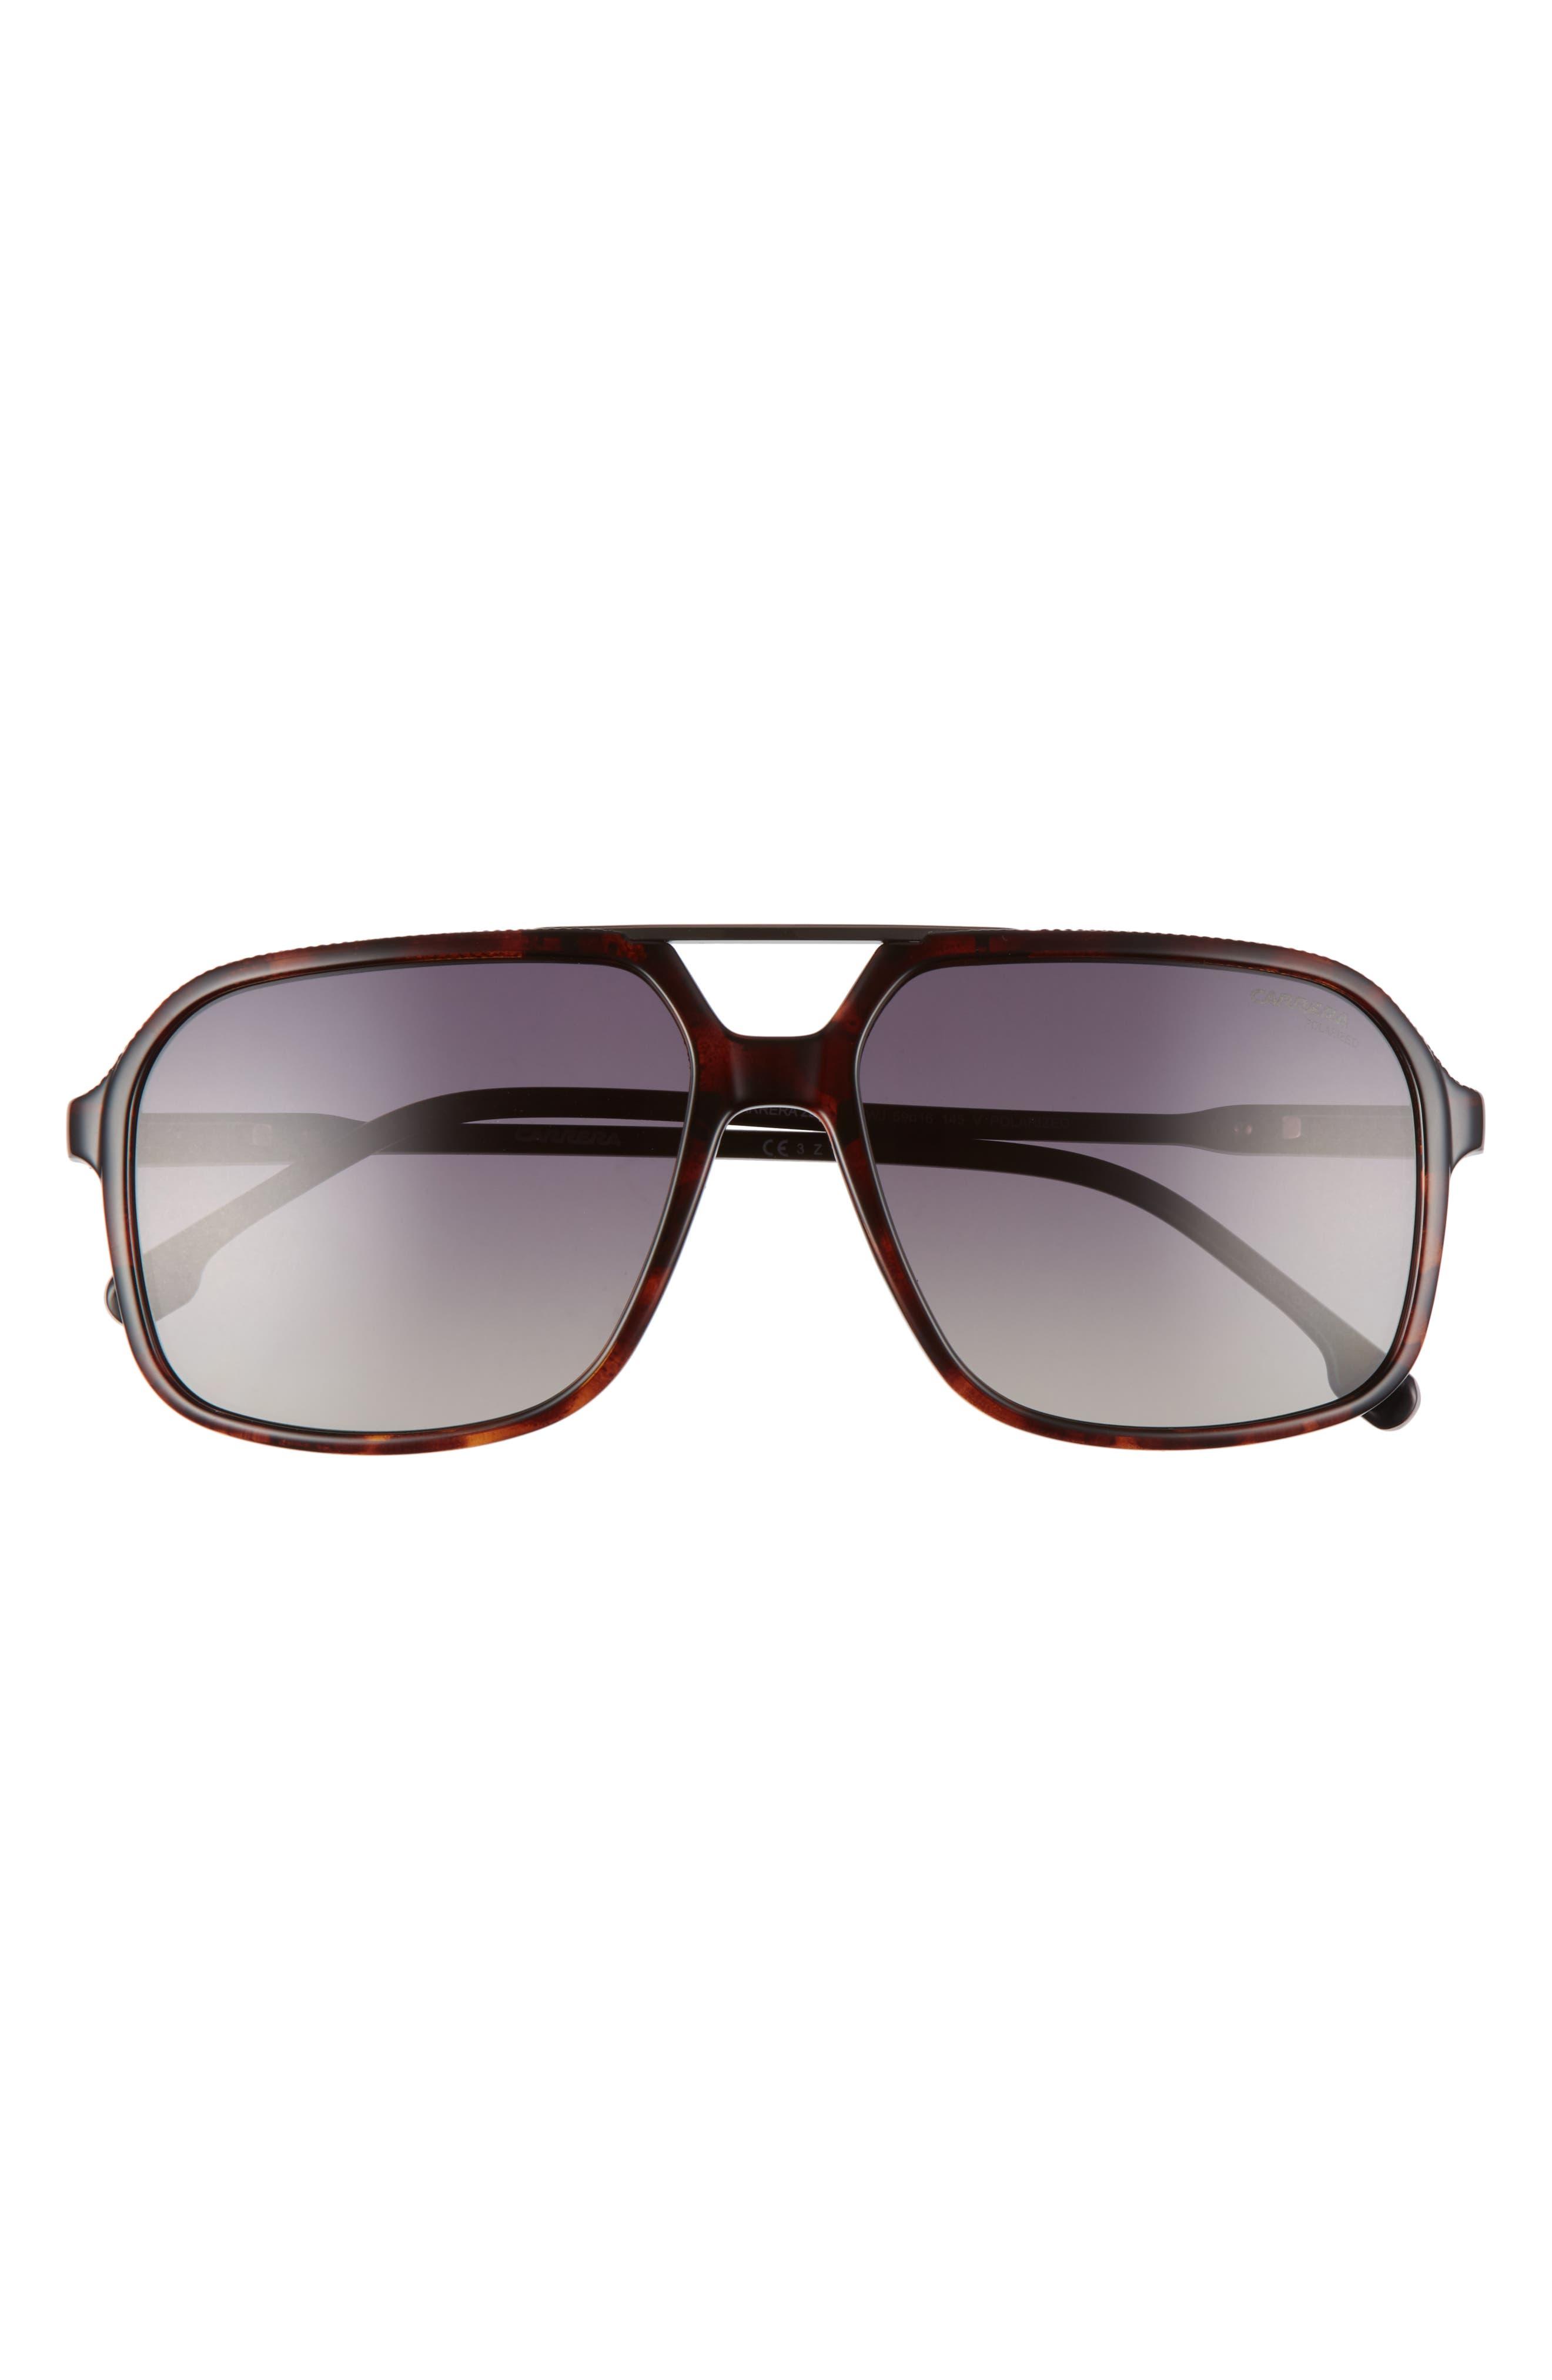 59mm Gradient Aviator Sunglasses